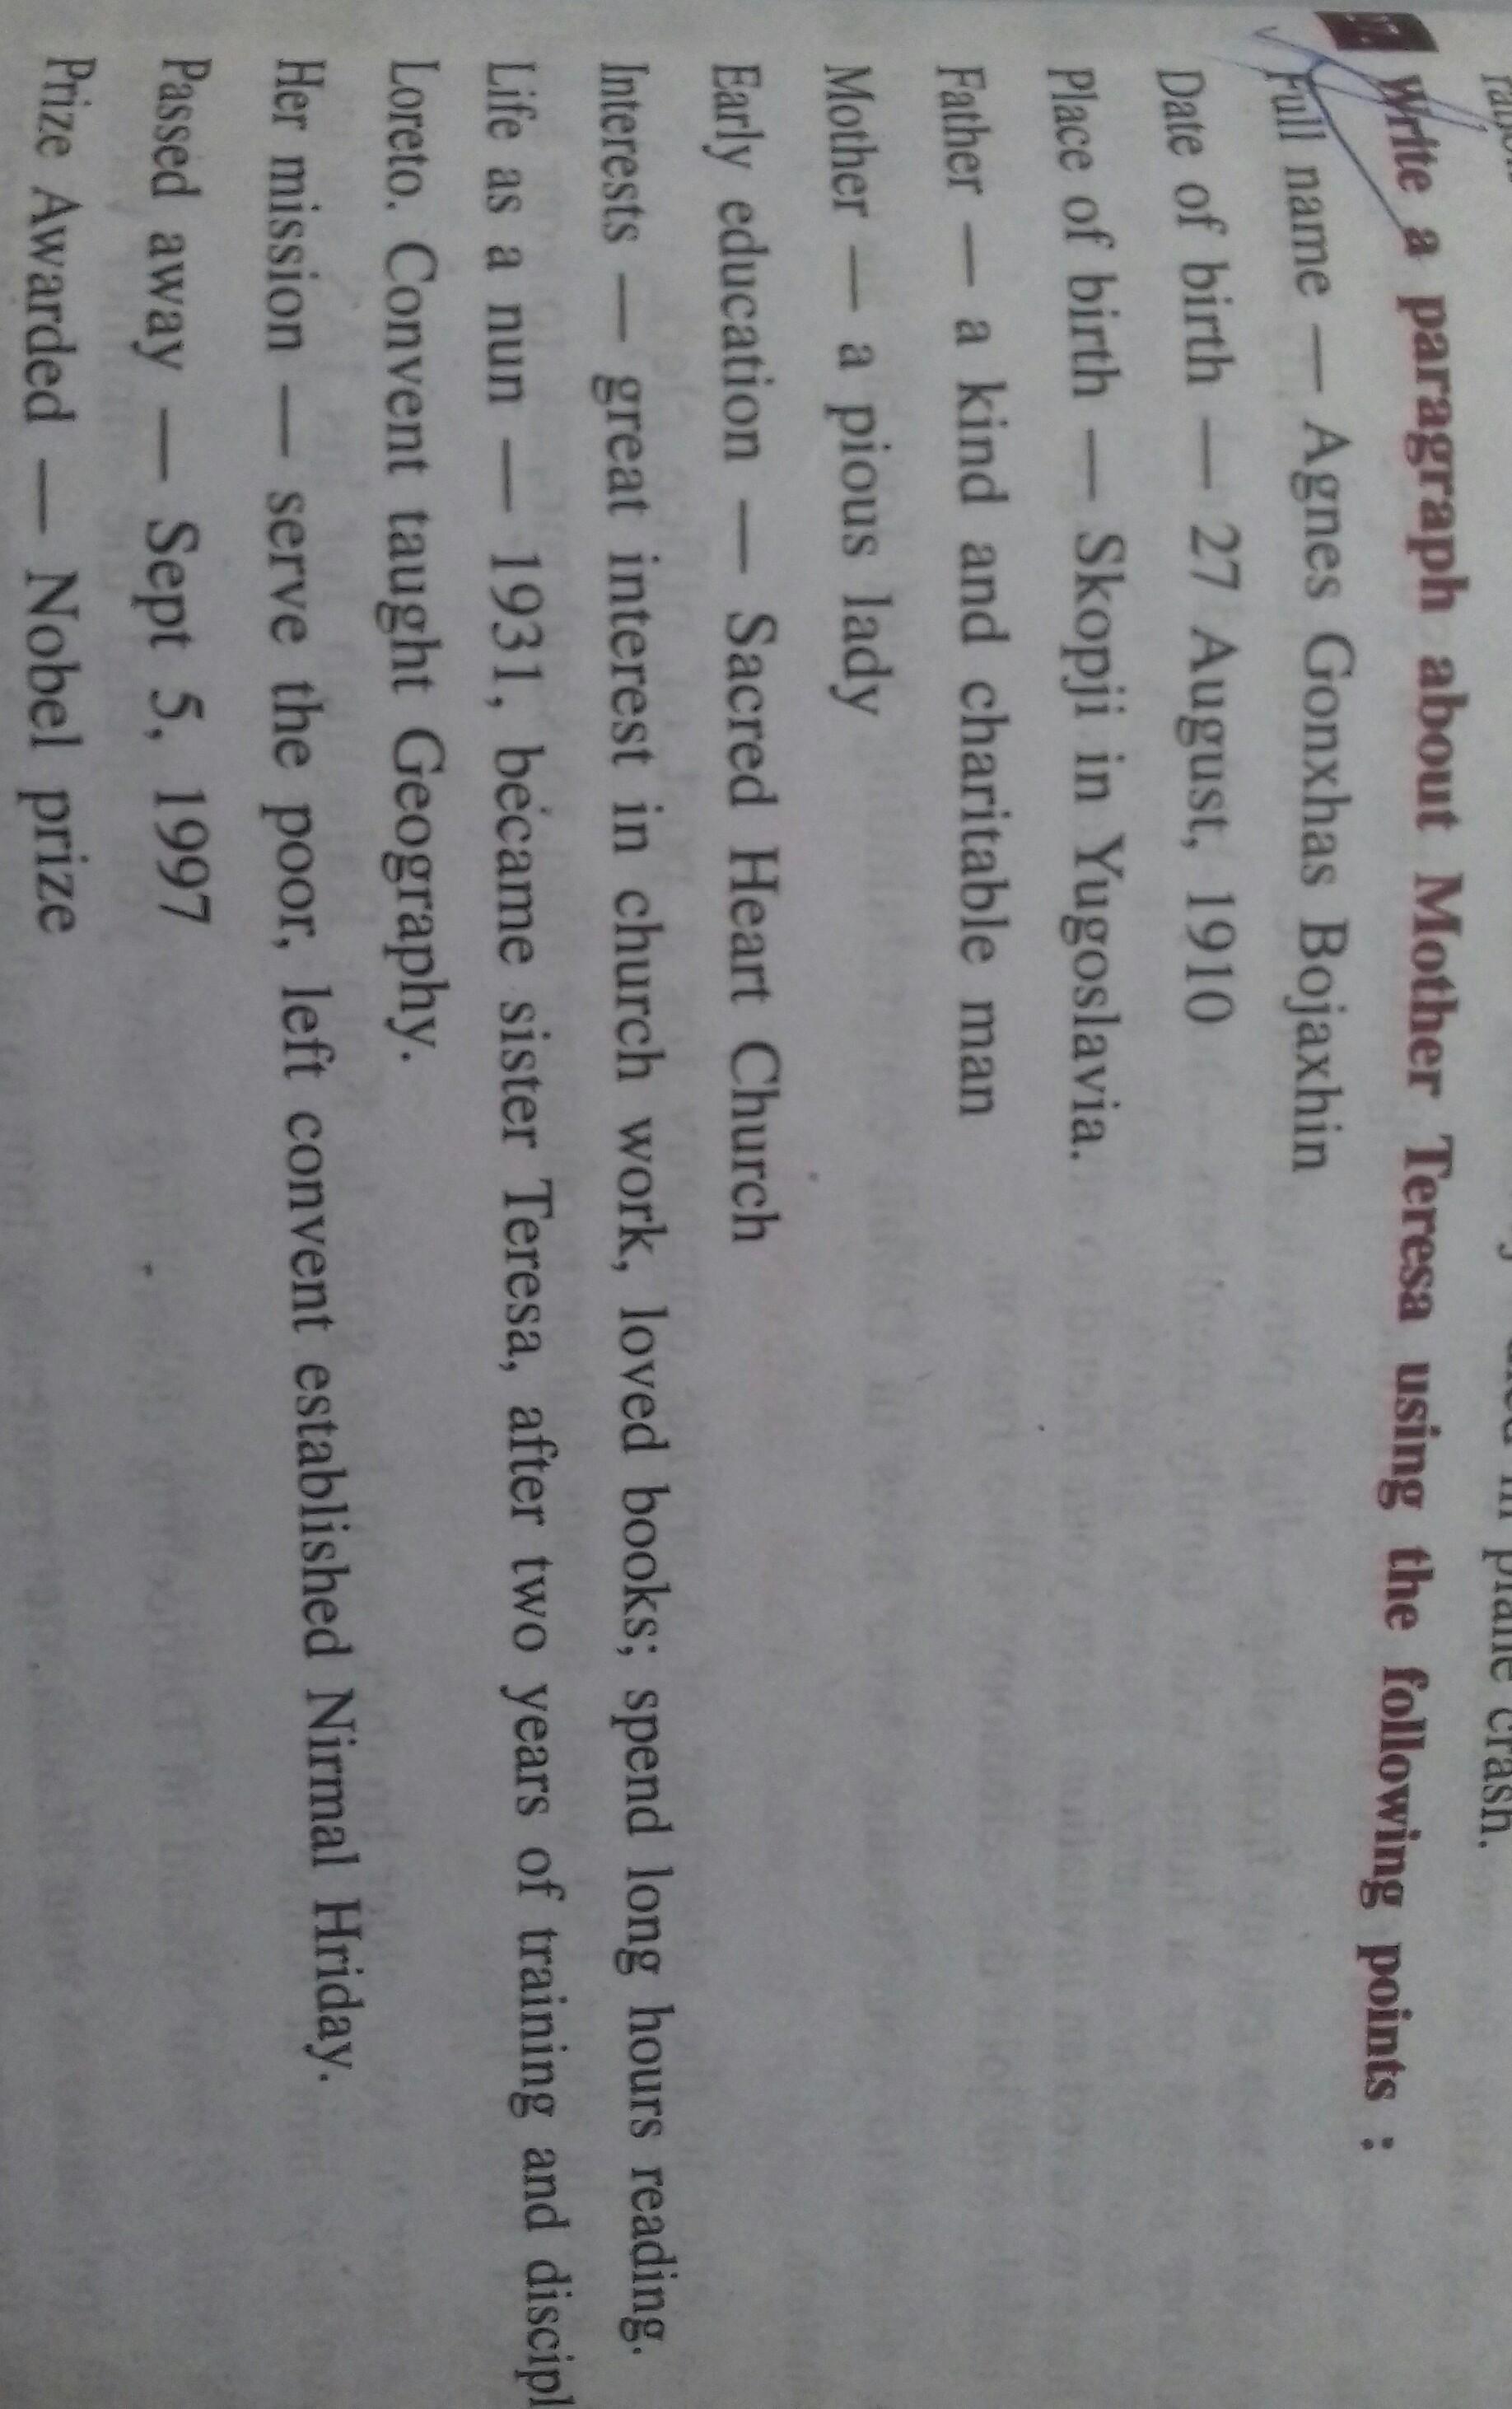 a short paragraph on mother teresa